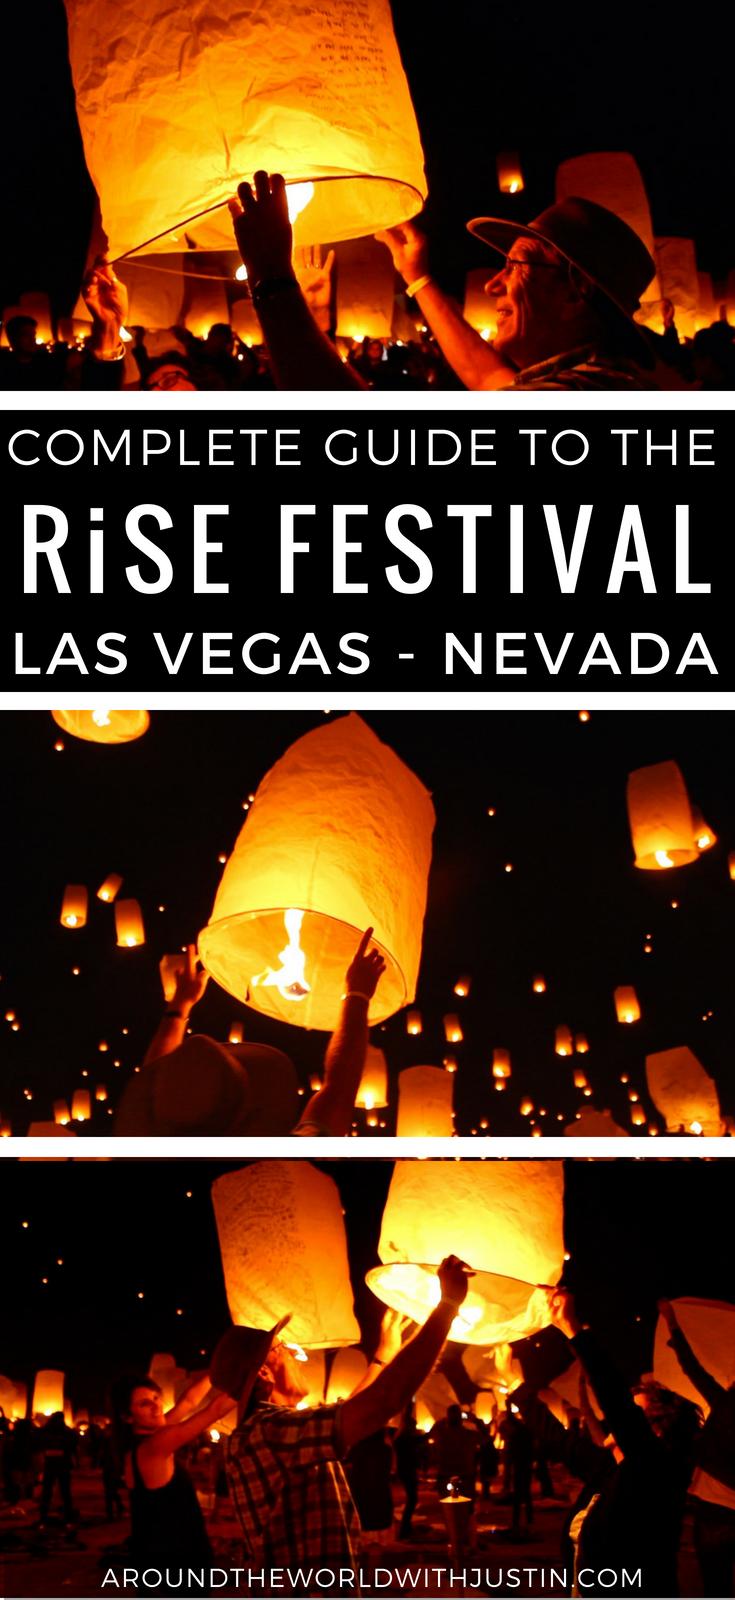 RiSE Lantern Festival Las Vegas Nevada